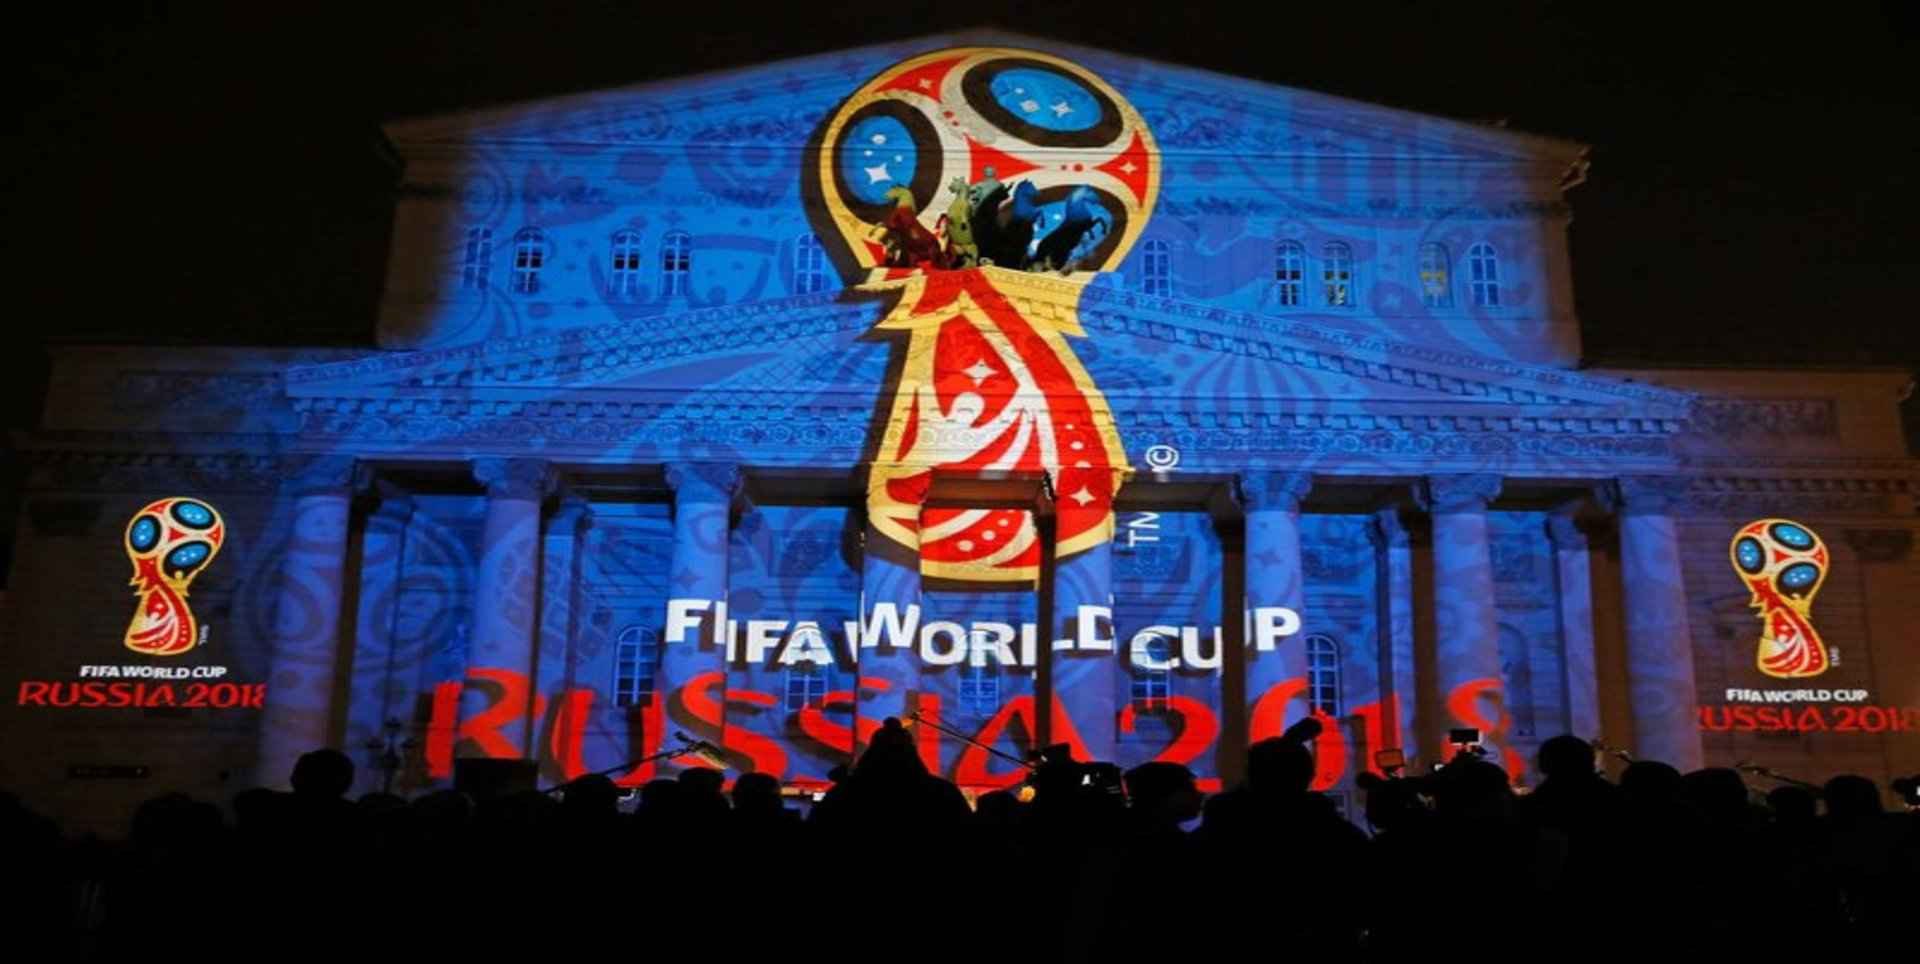 2018 FIFA AFC Third Round Qatar VS Iran Live HD